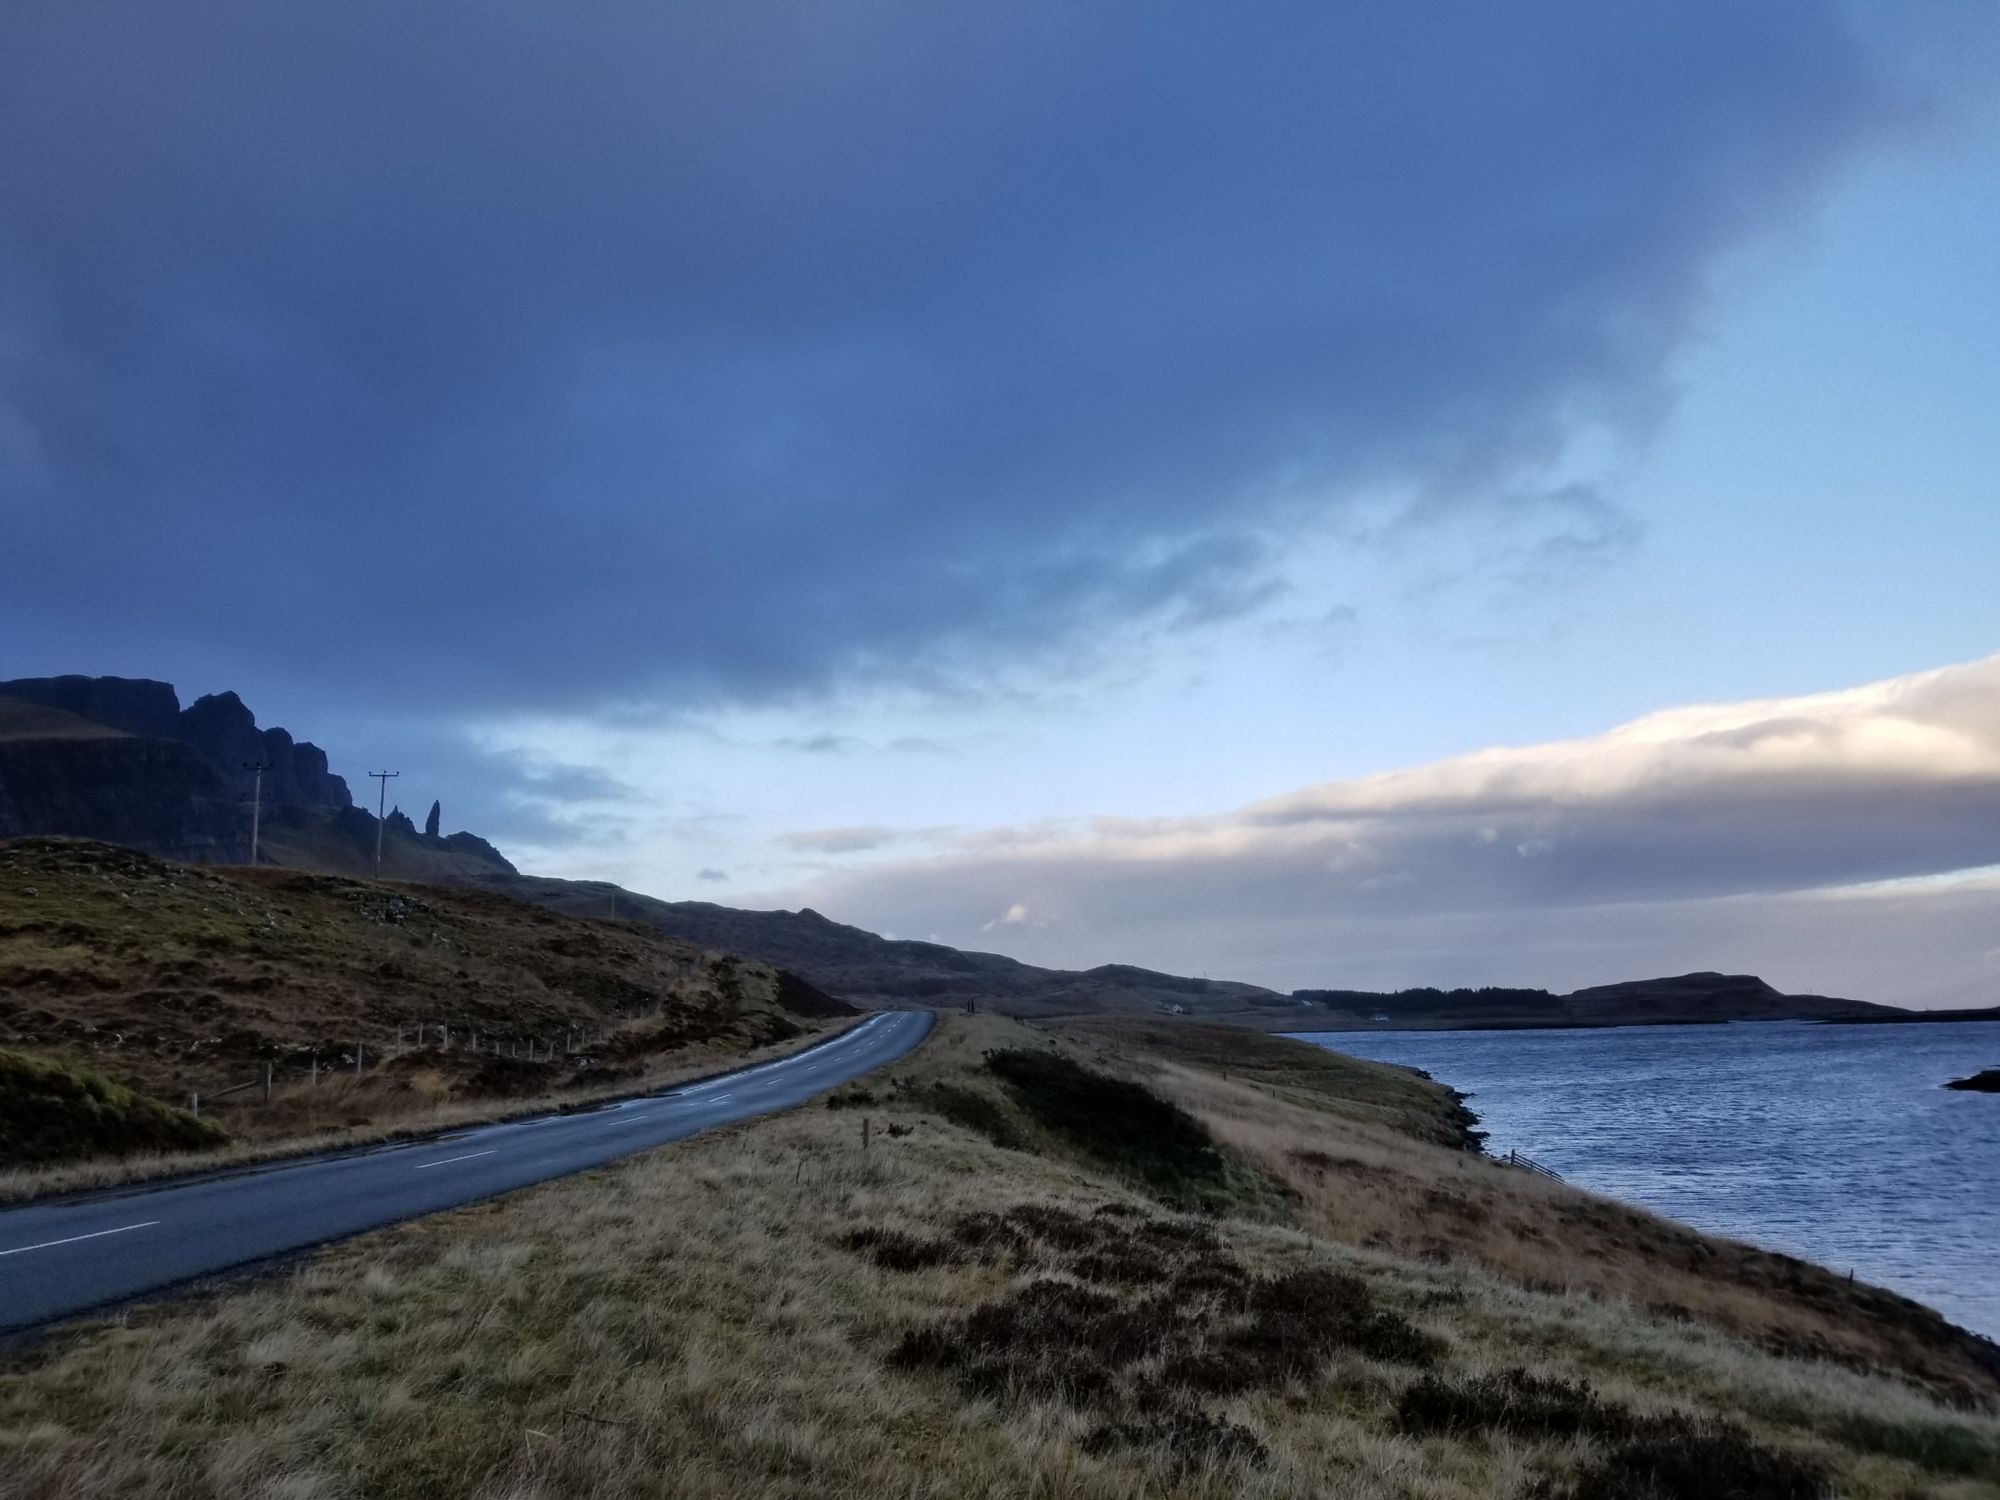 On the highland